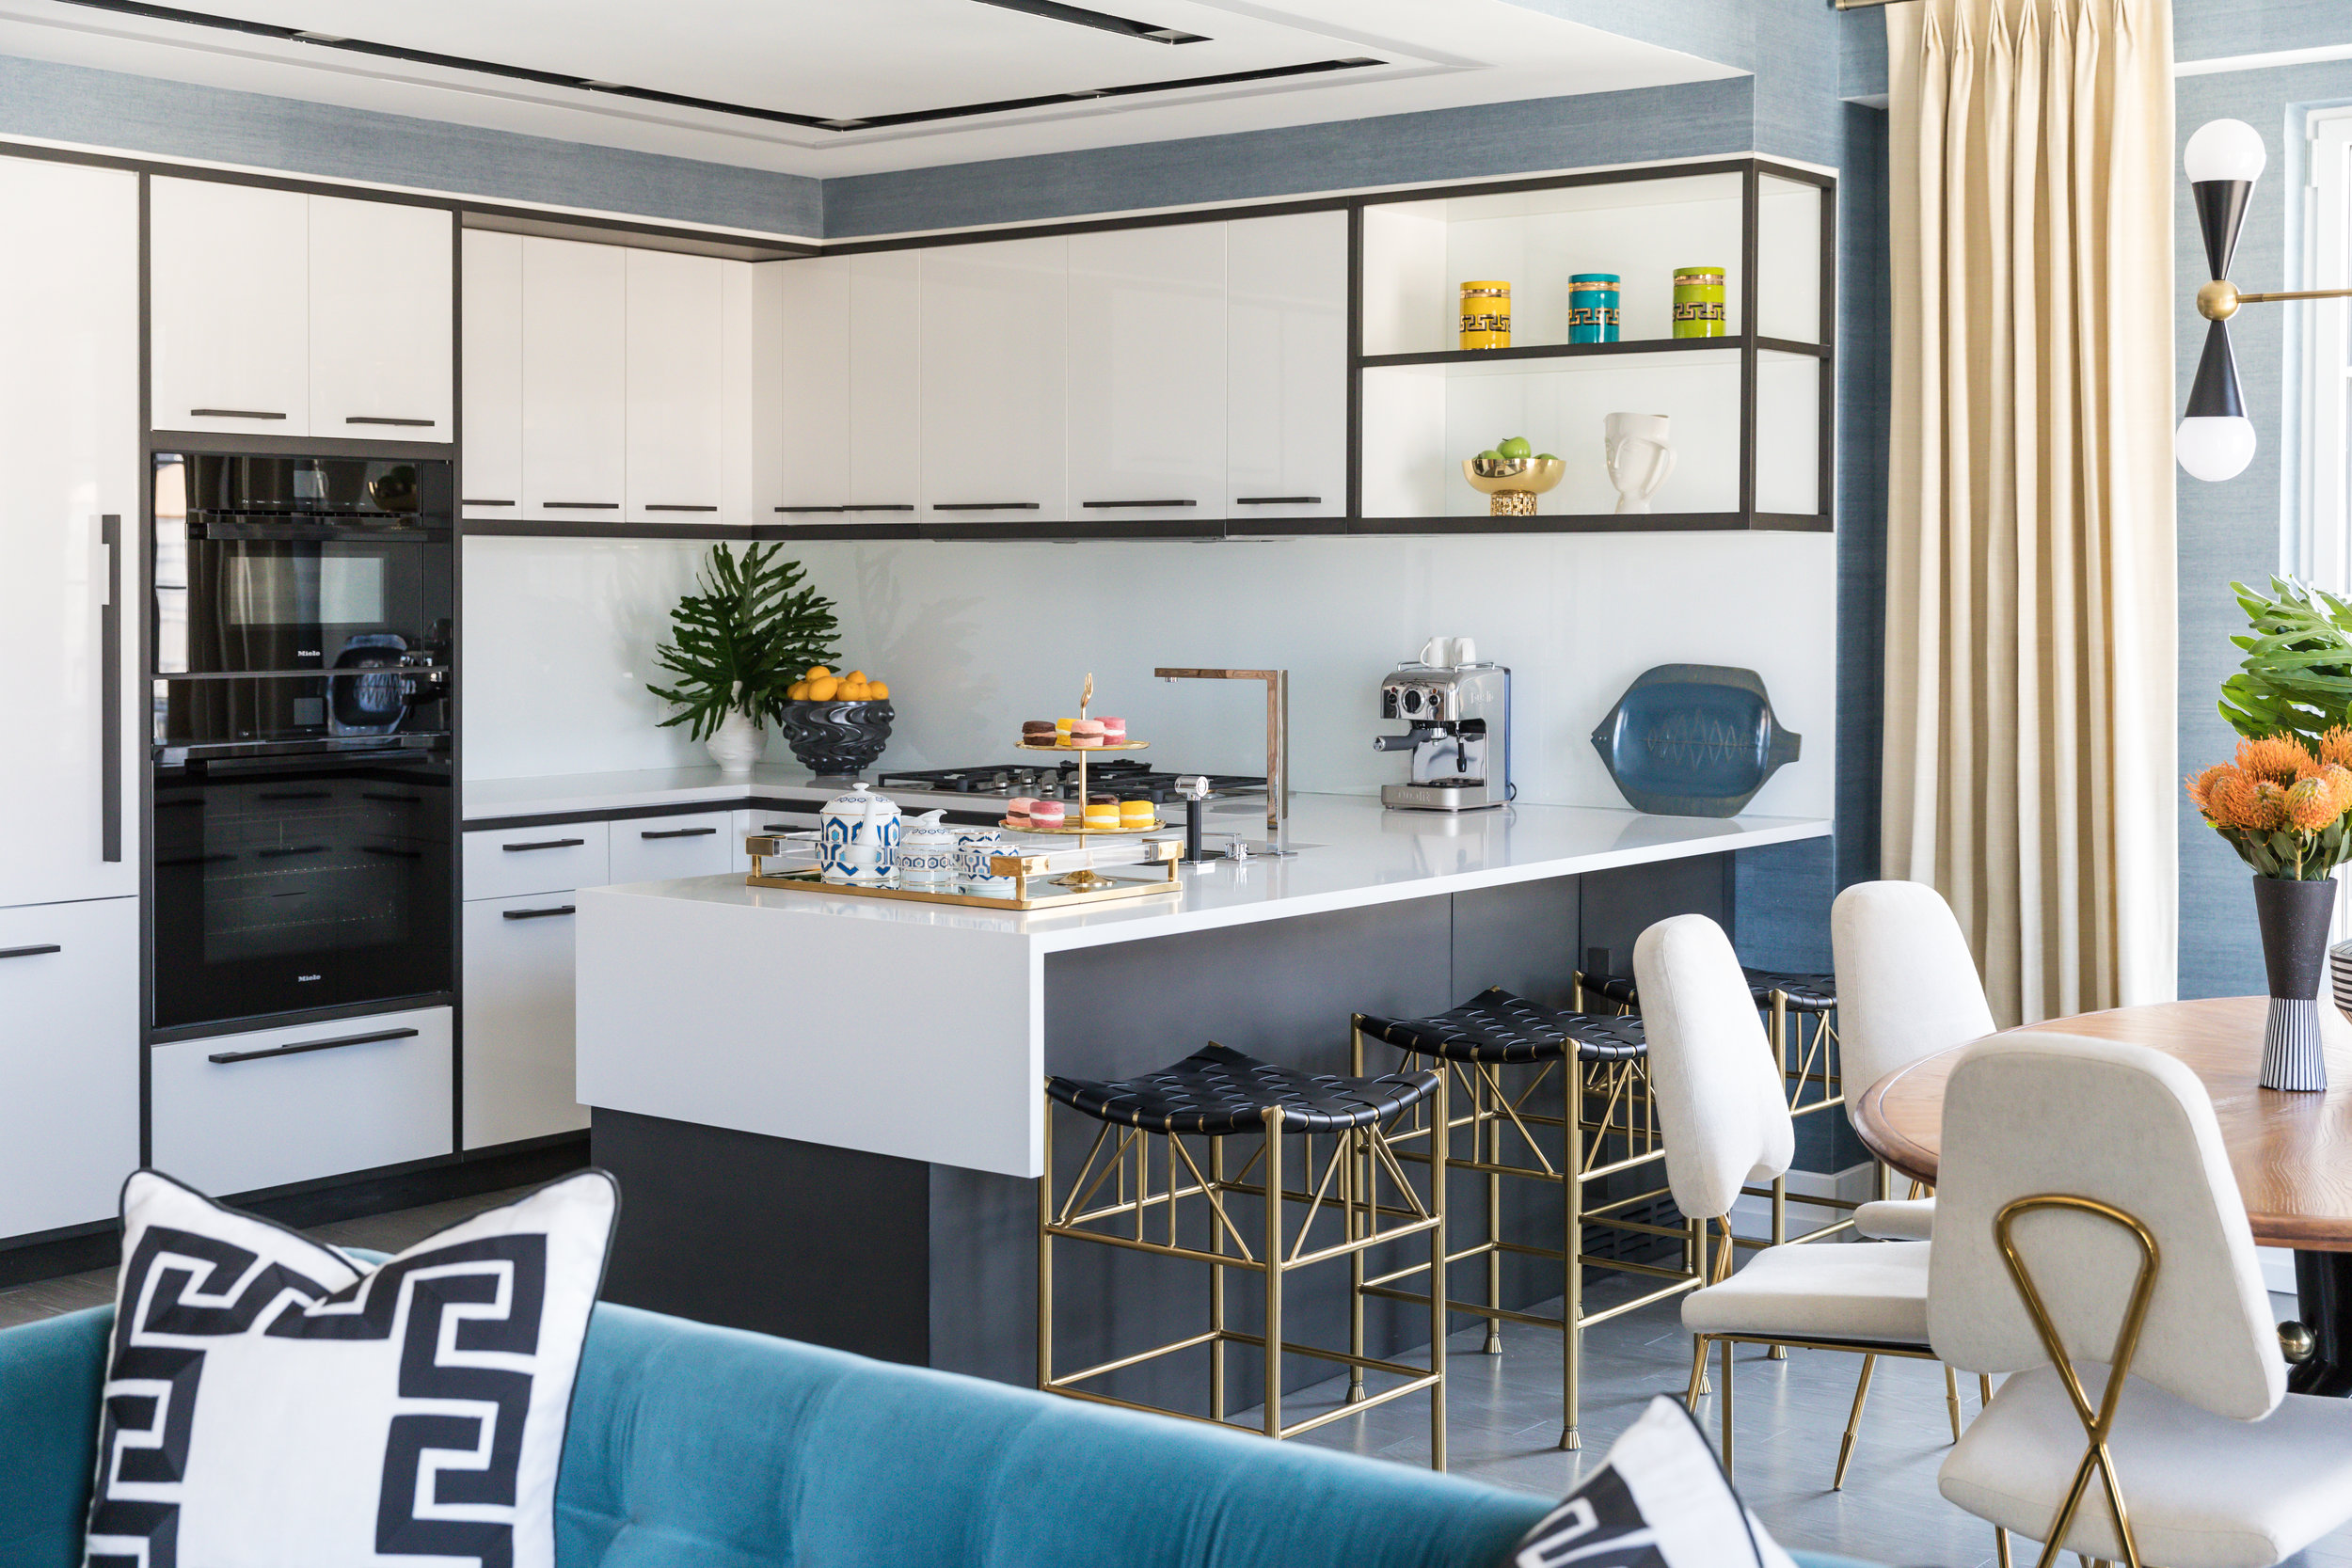 Extell Unveils Model Residences Designed by Jonathan Adler at 70 Charlton in West Soho